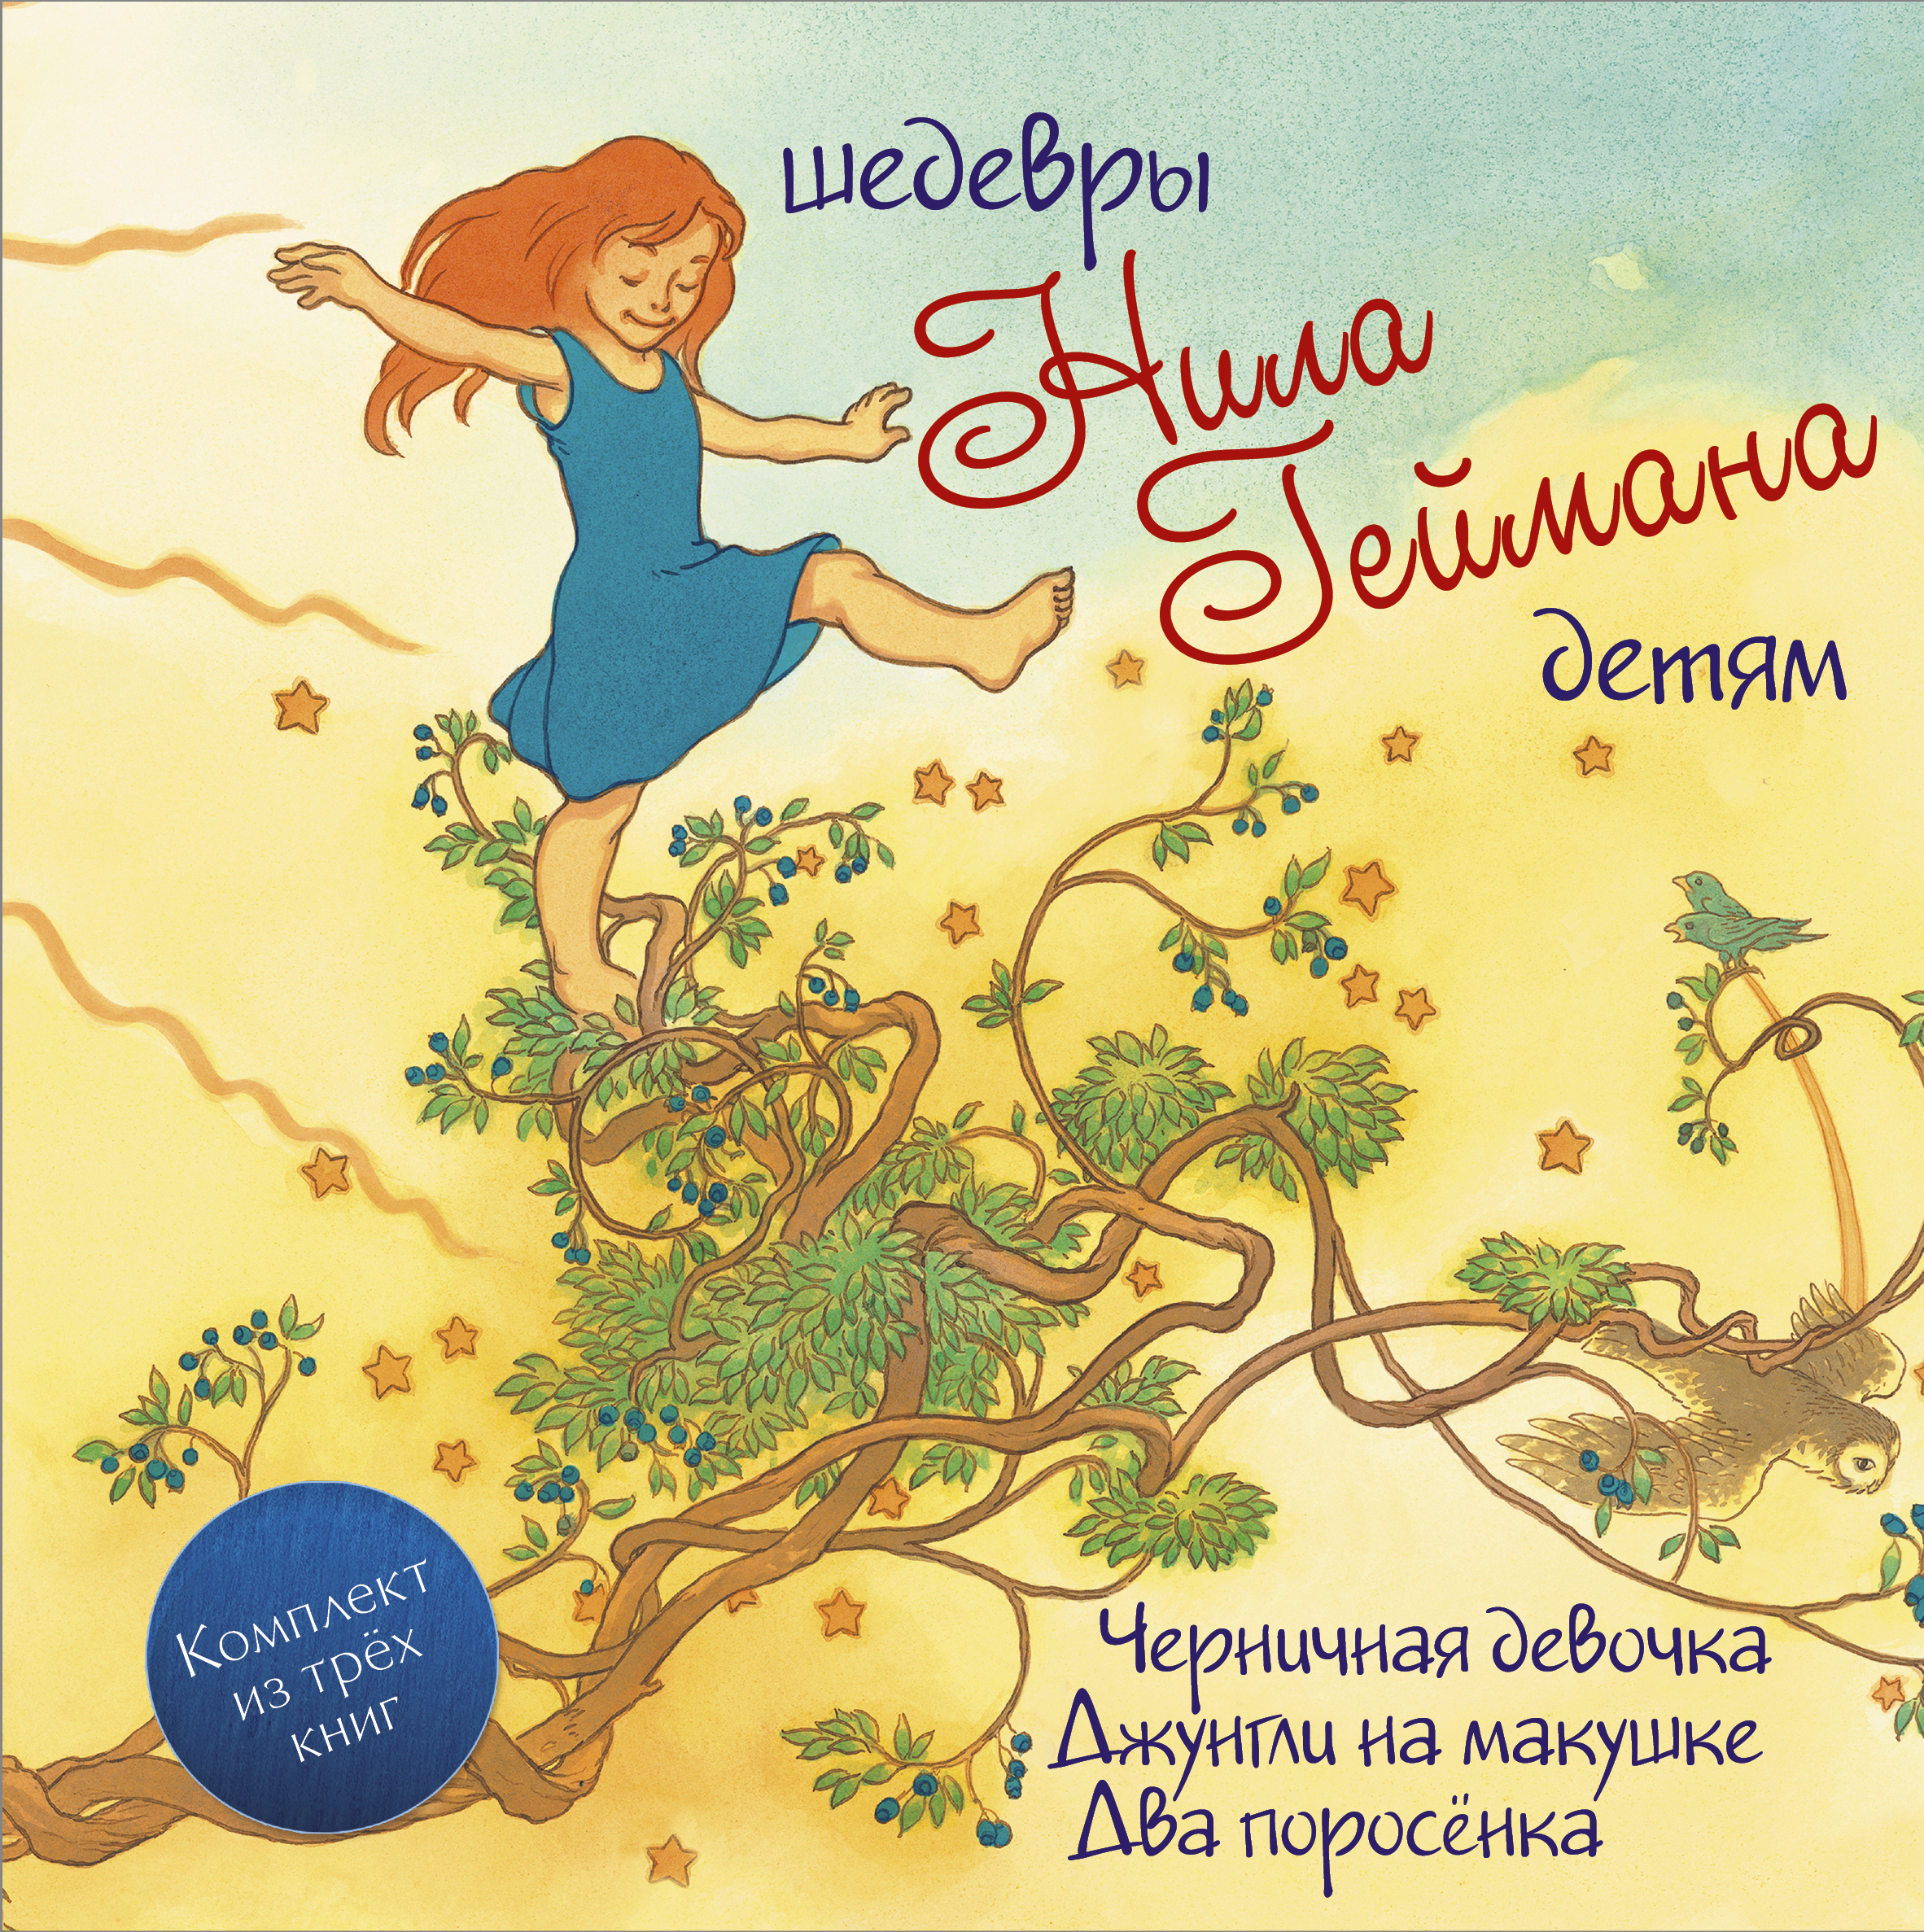 Гейман Н. Шедевры Н. Геймана детям + подарок